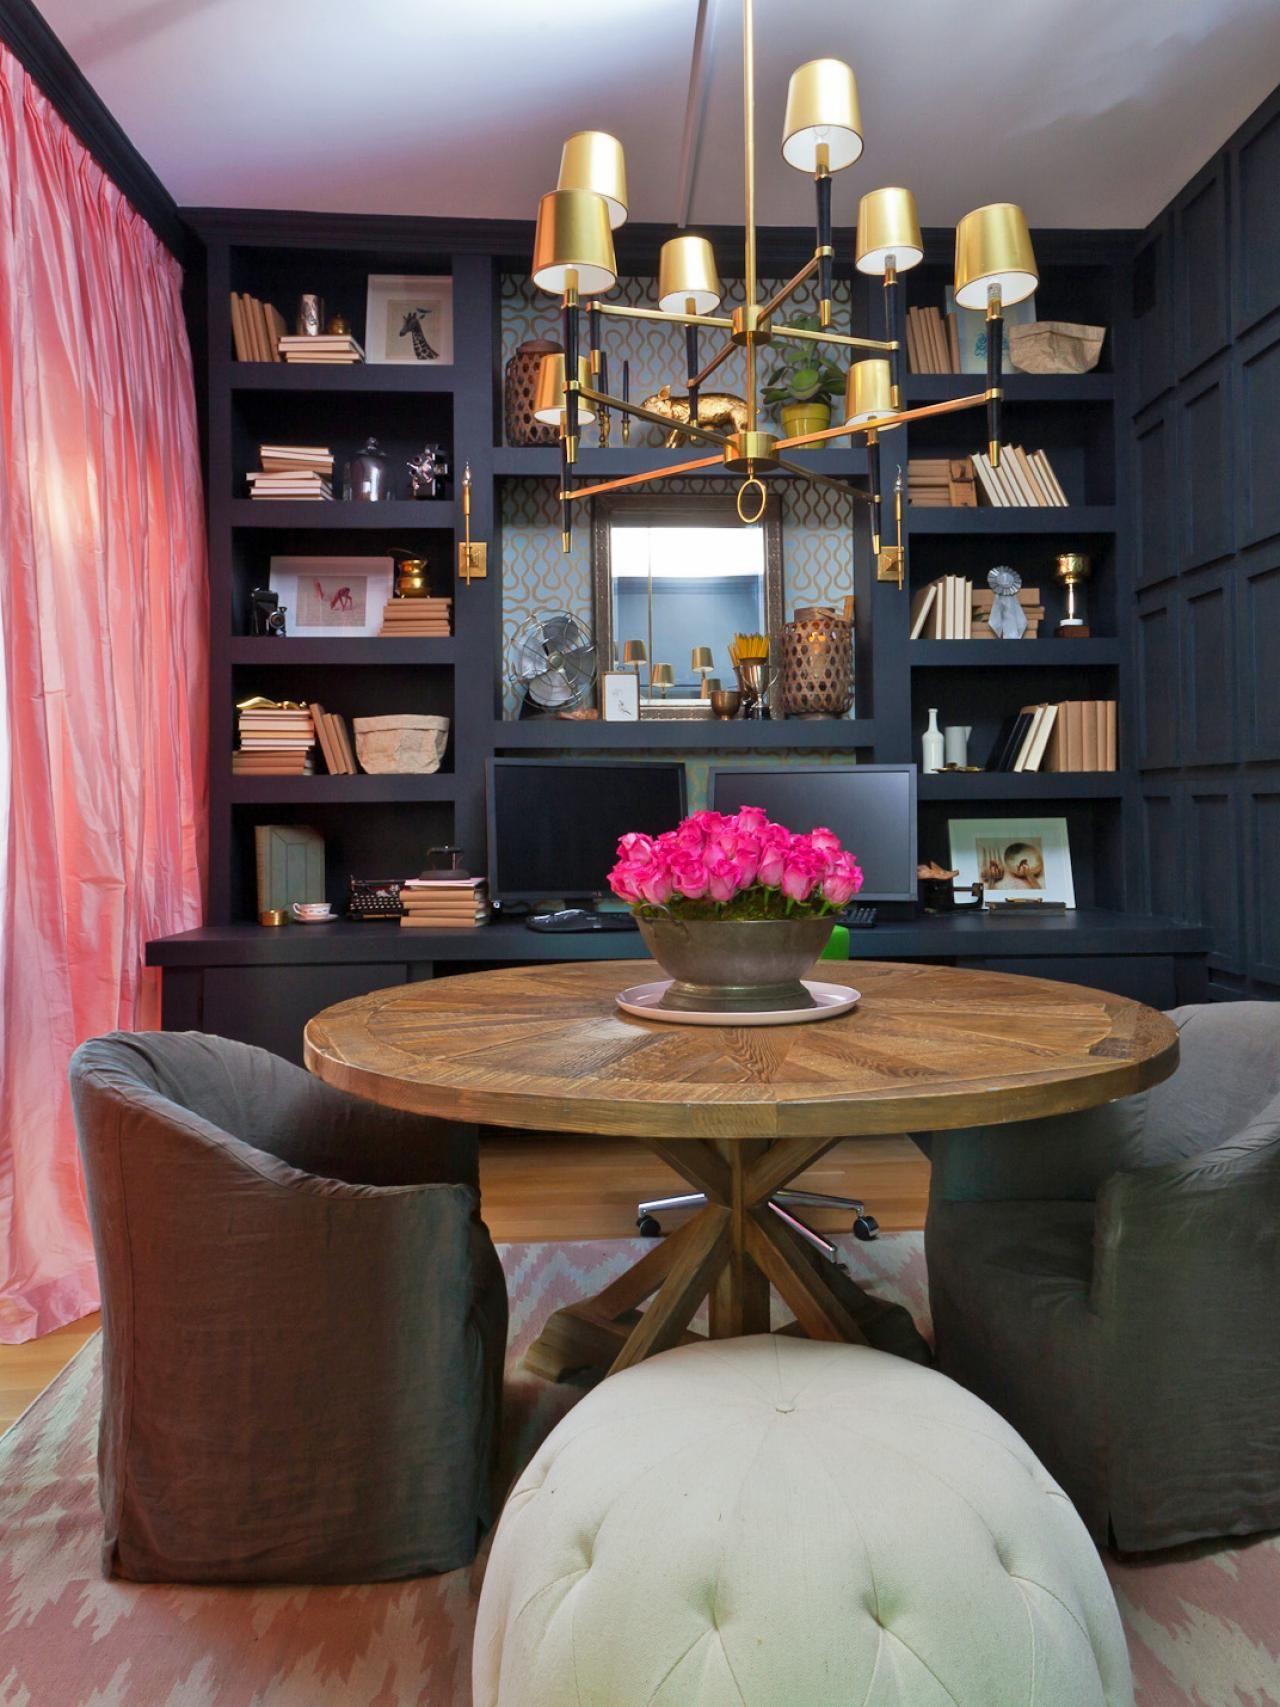 hgtv office design. Find The Best Of Dear Genevieve From HGTV Hgtv Office Design T